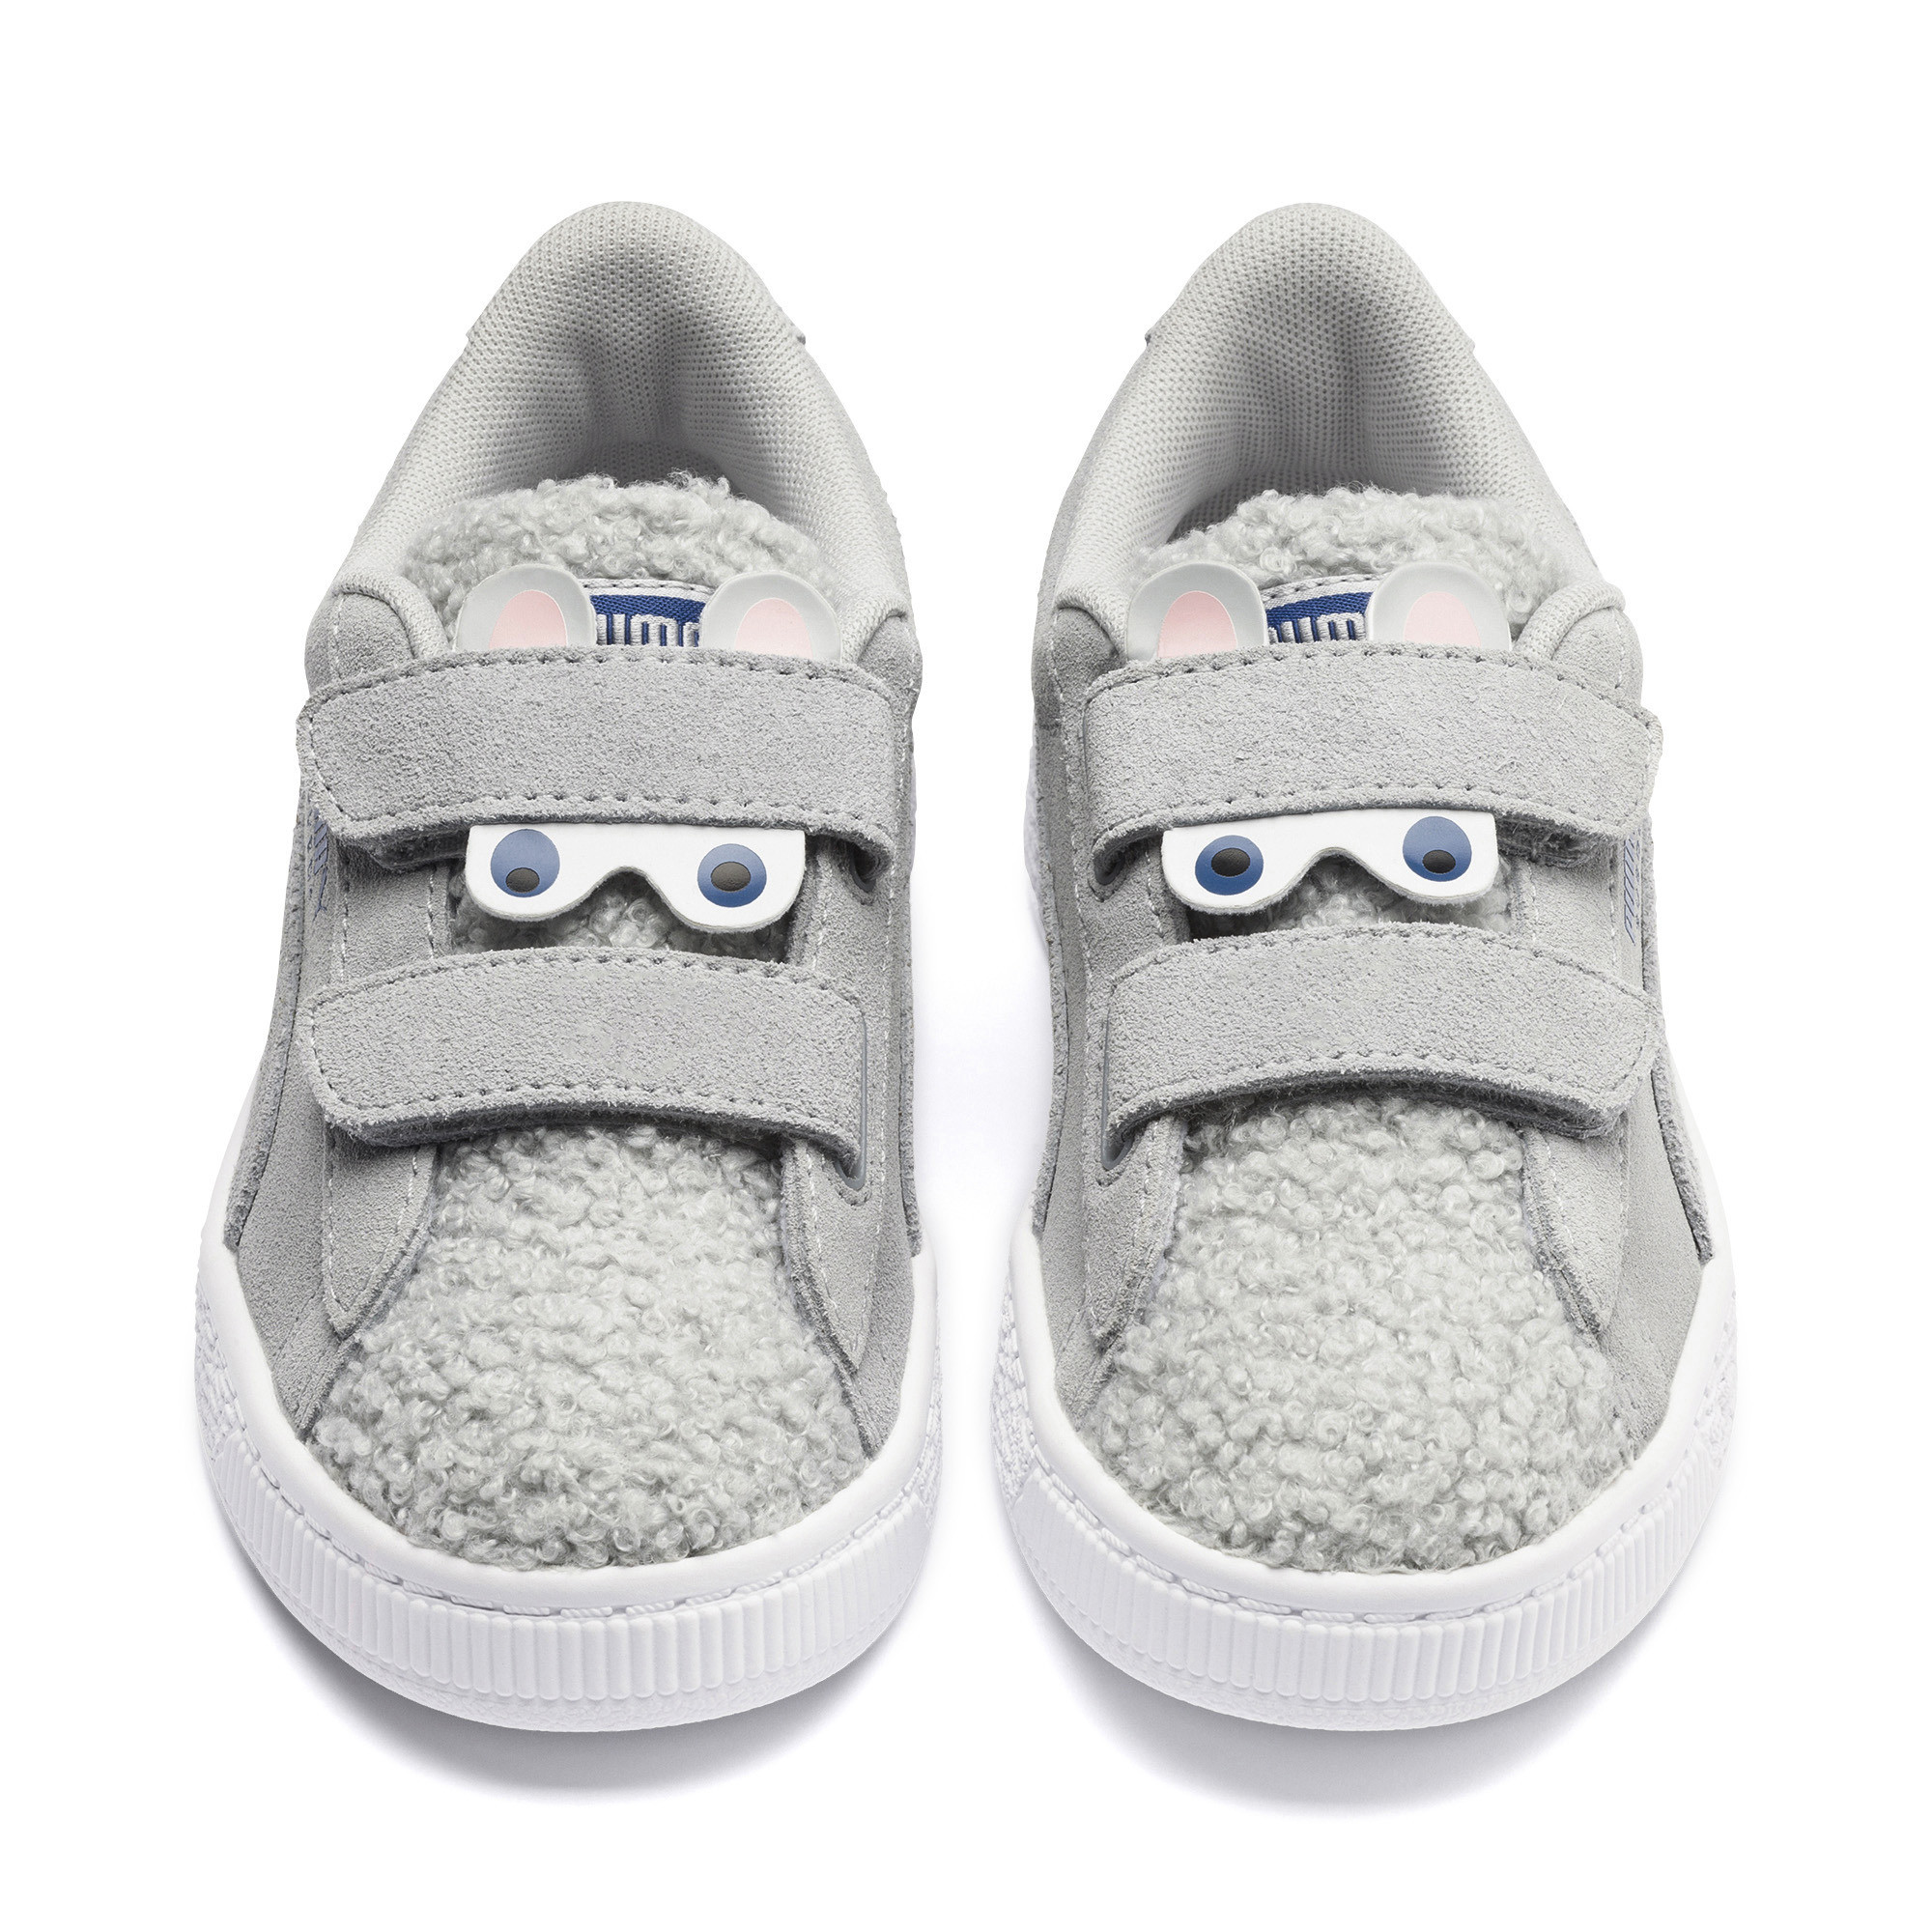 PUMA-Suede-Winter-Monster-Little-Kids-039-Shoes-Kids-Shoe-Kids thumbnail 15